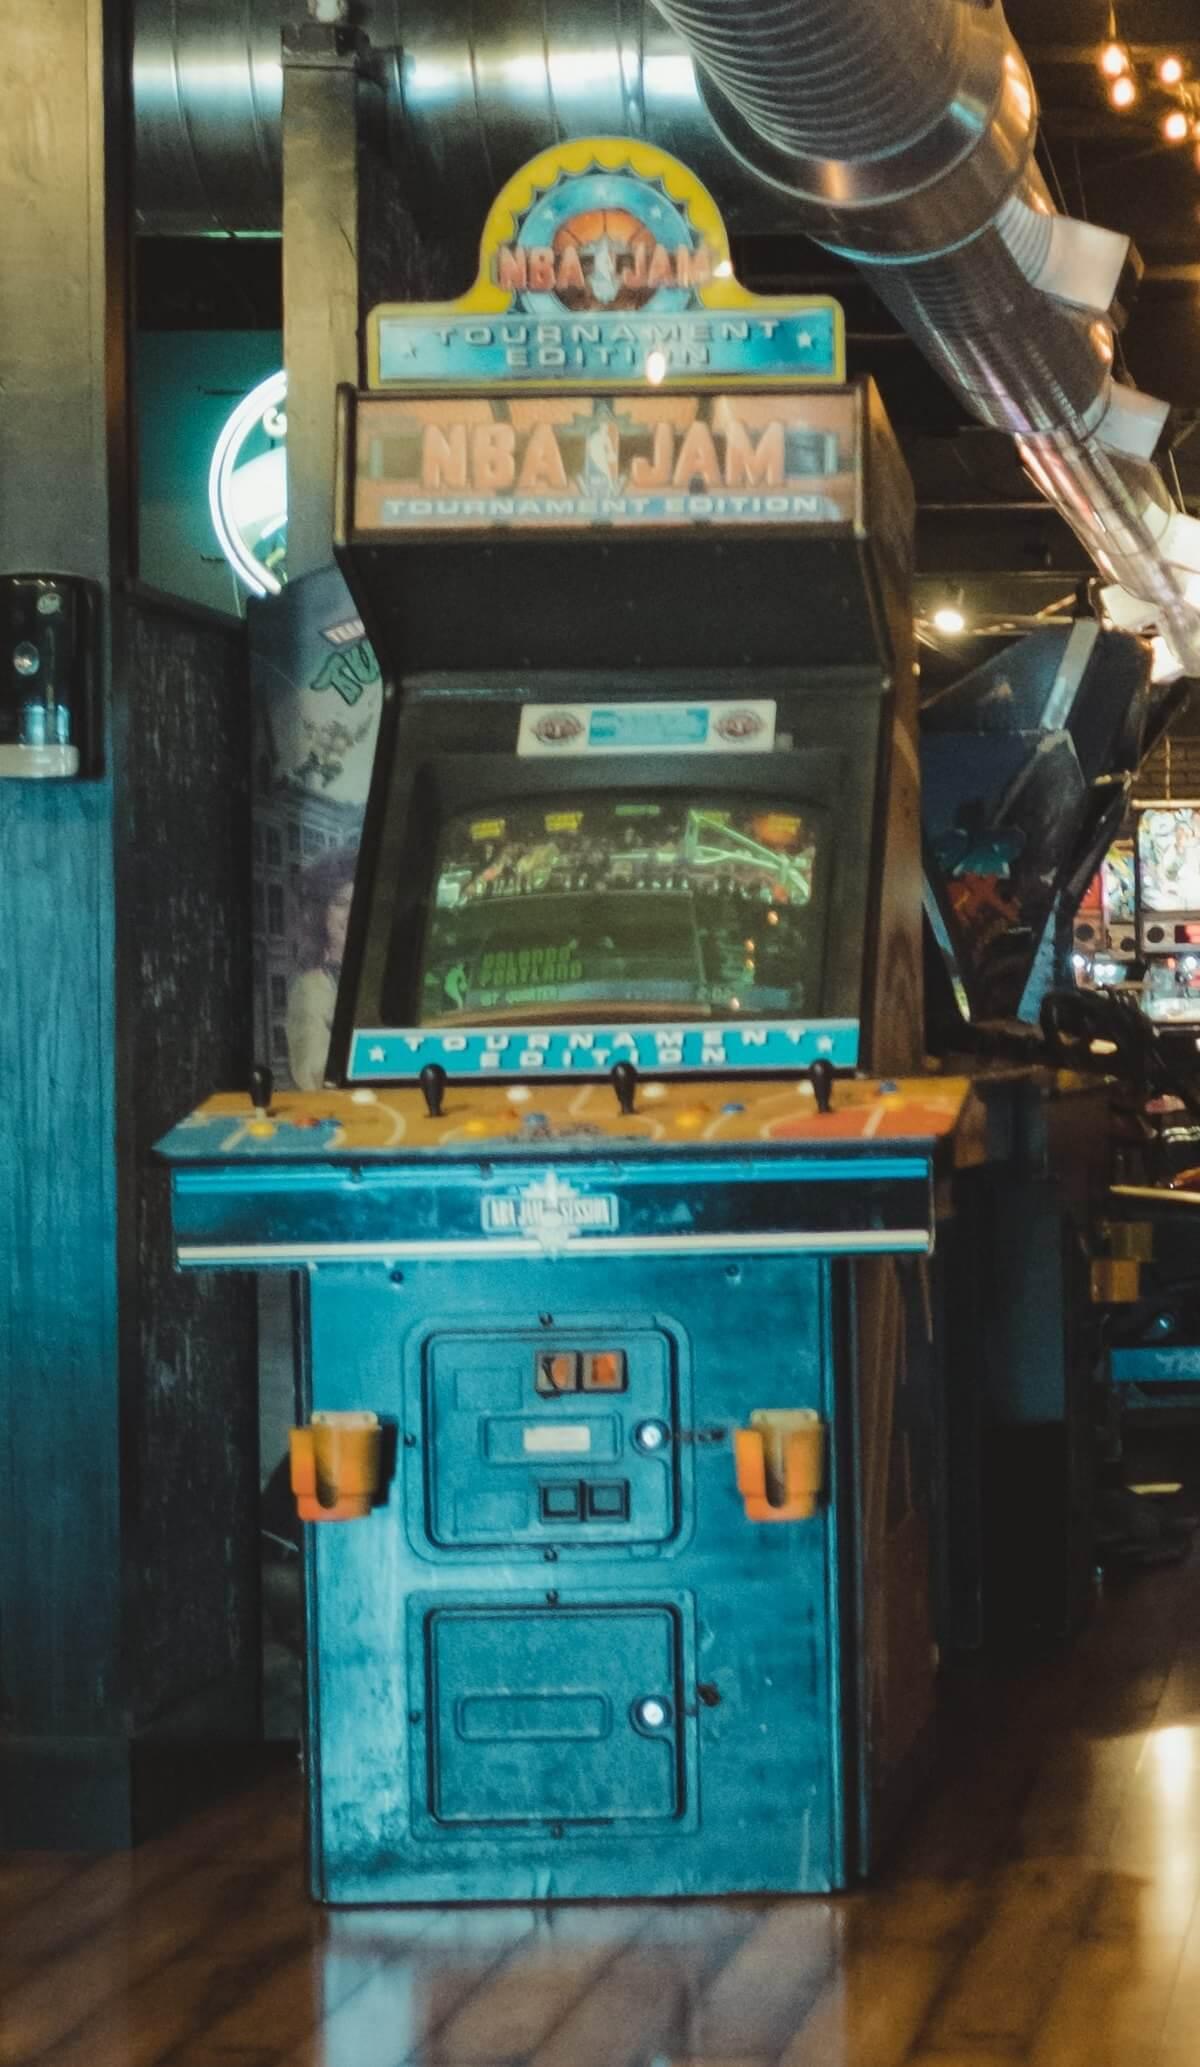 NBA Jam Tournament Edition - Spielhalle Arcade